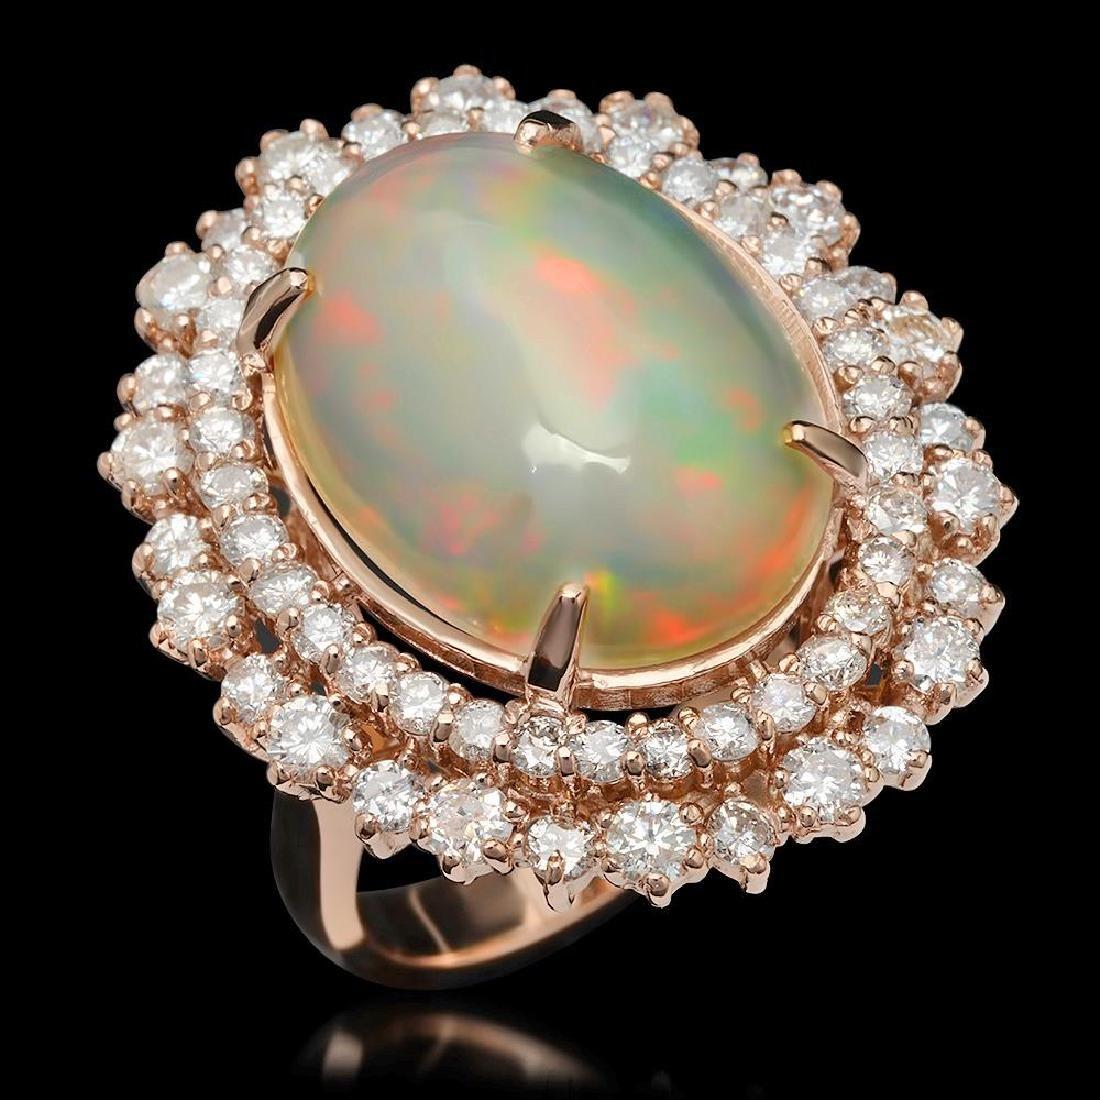 14K Gold 7.38ct Opal & 2.12ct Diamond Ring